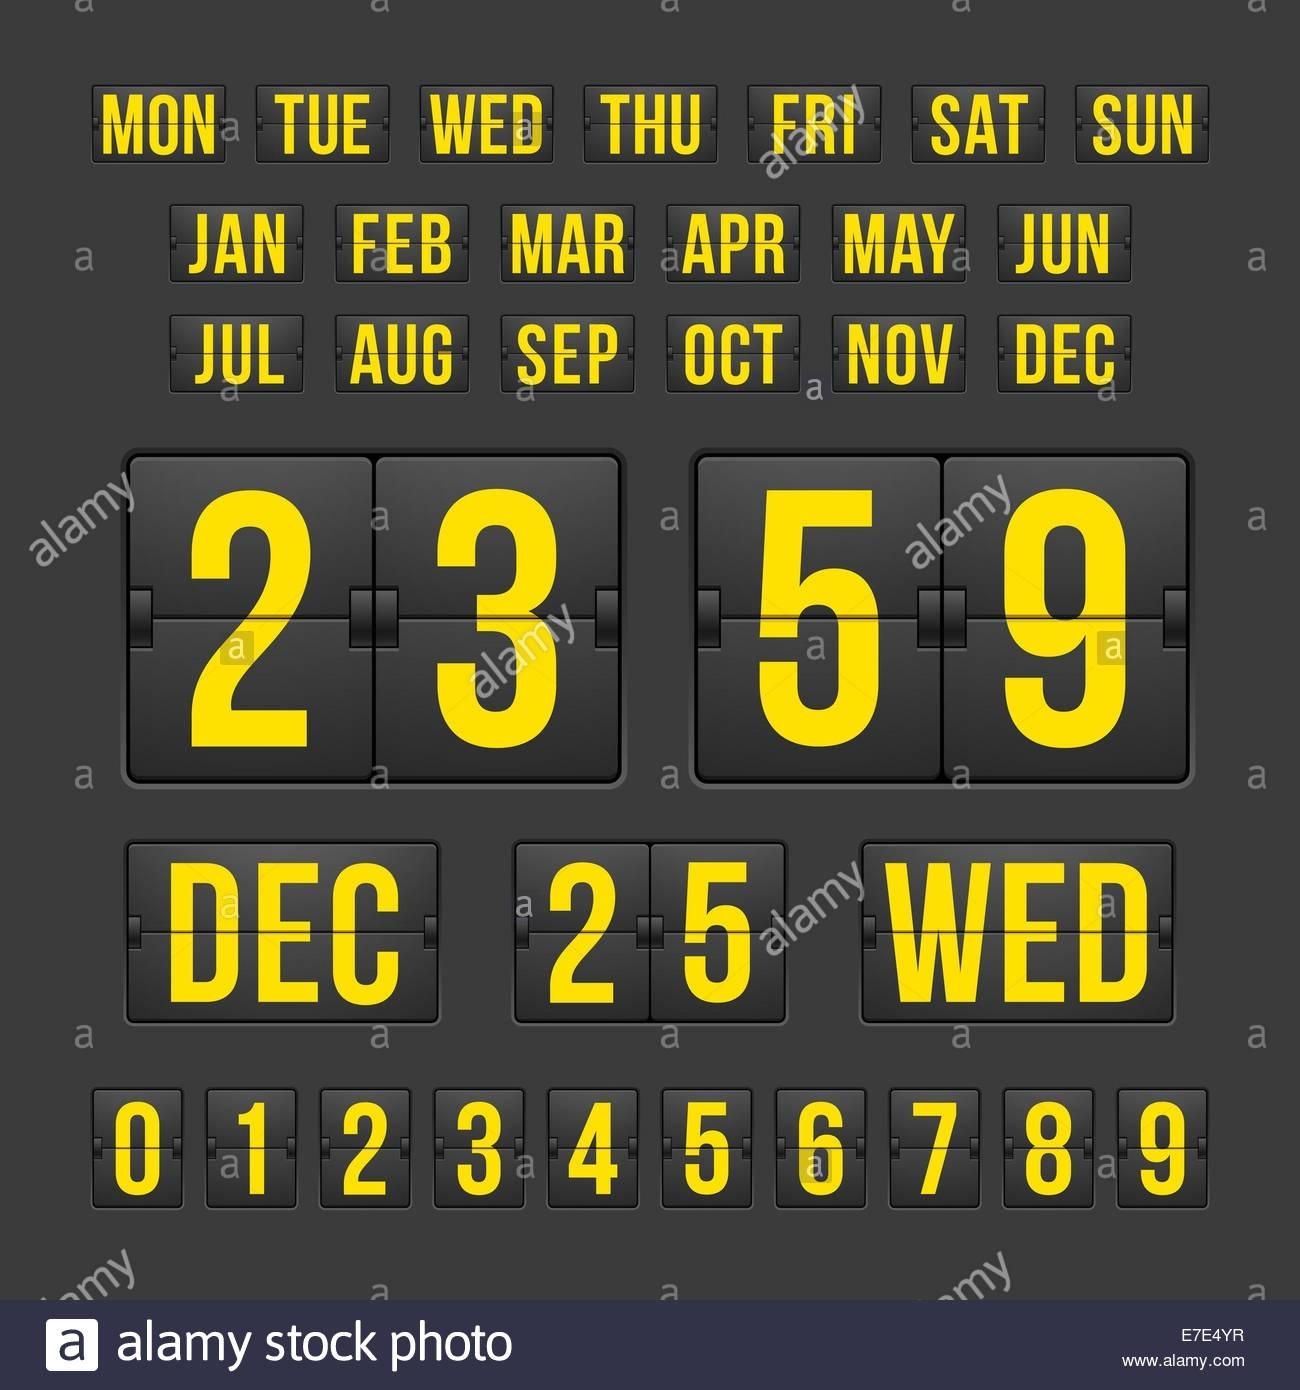 Countdown Timer And Date, Calendar Scoreboard Stock Photo: 73455307_1 Year Countdown Calendar